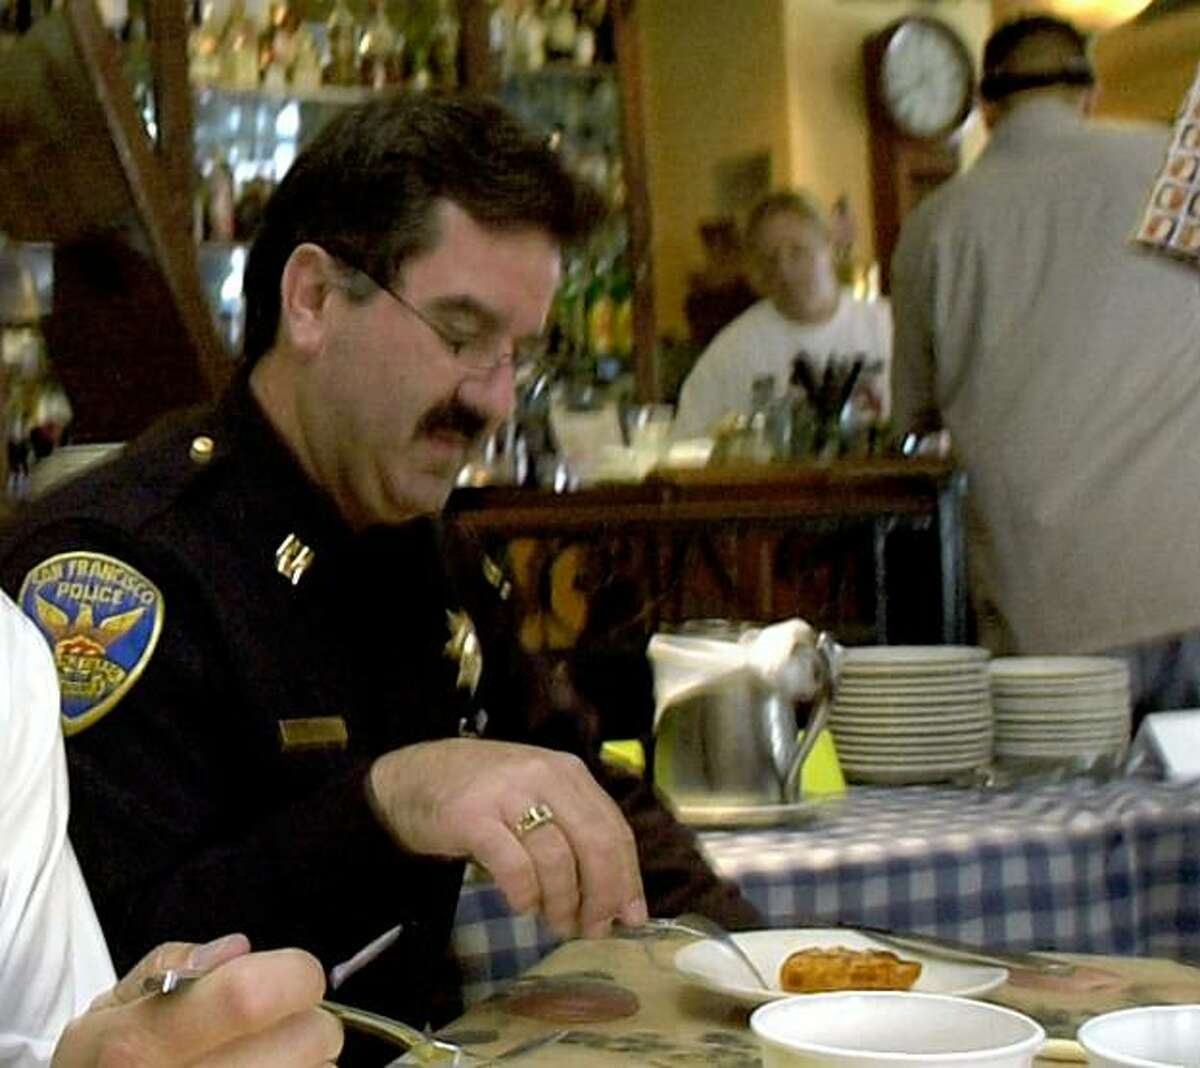 SF Police Captain Steve Tacchini